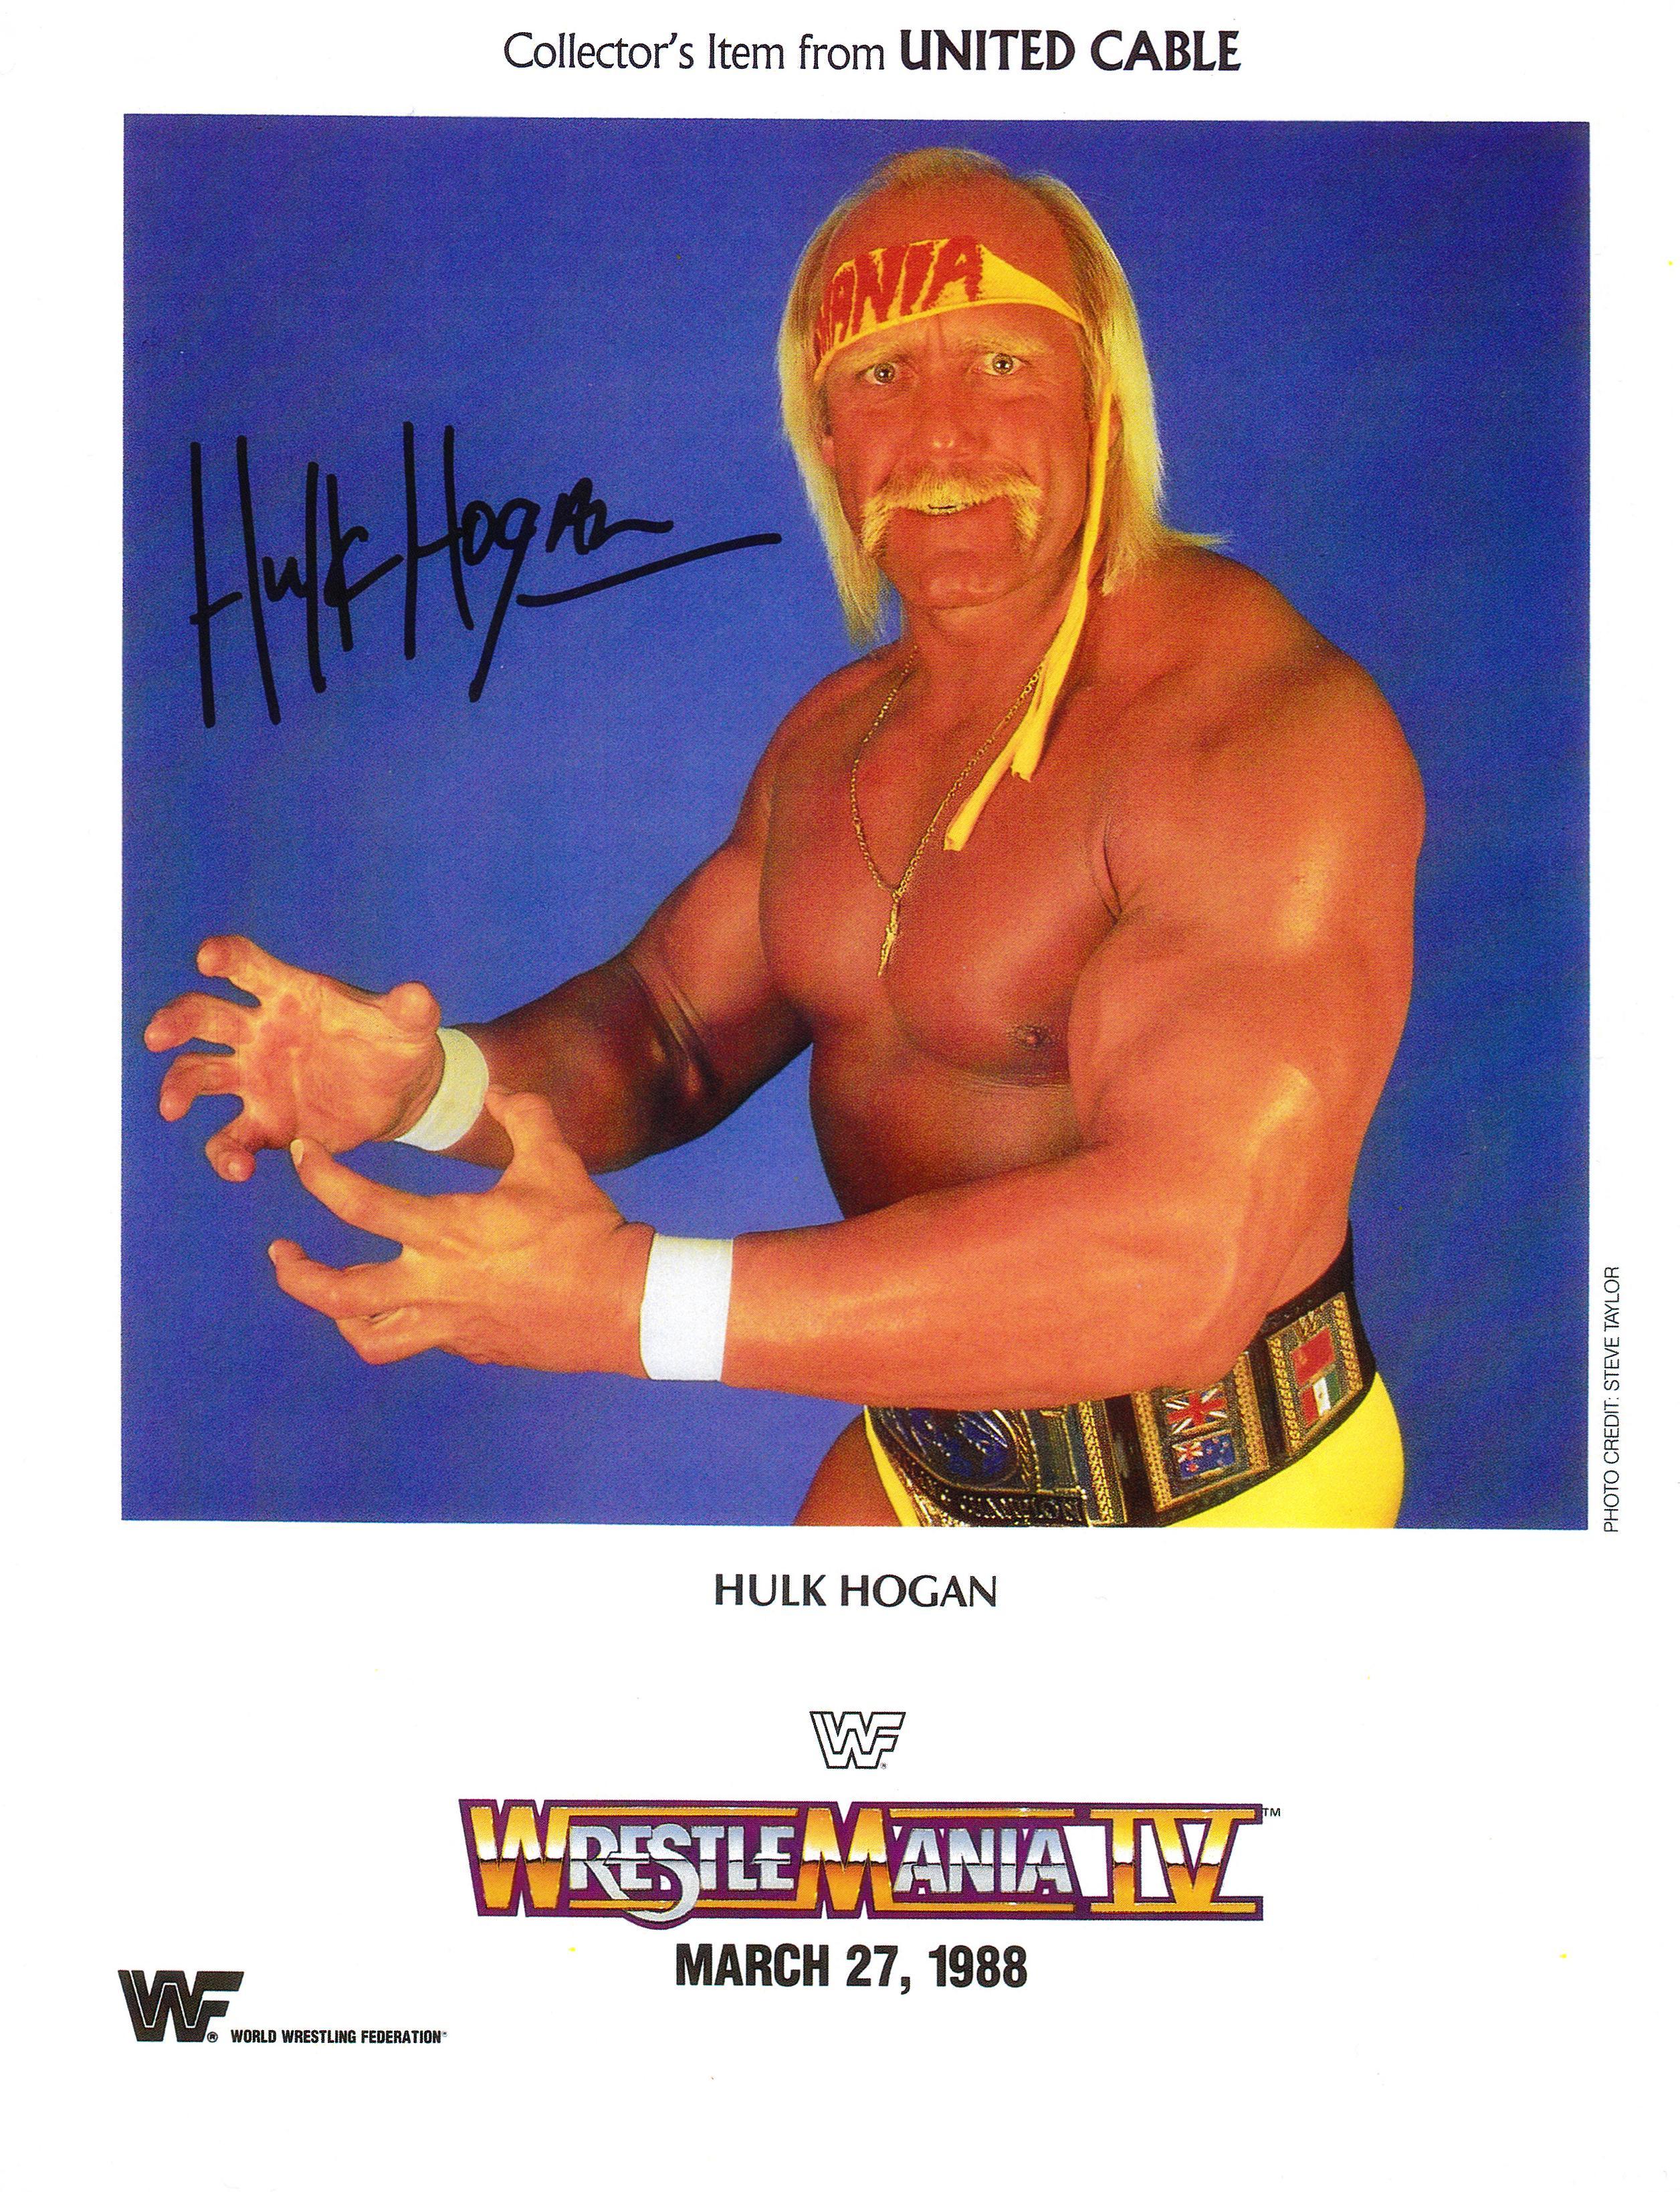 Hulk Hogan - Brooke Hogan's Father - TheRichest